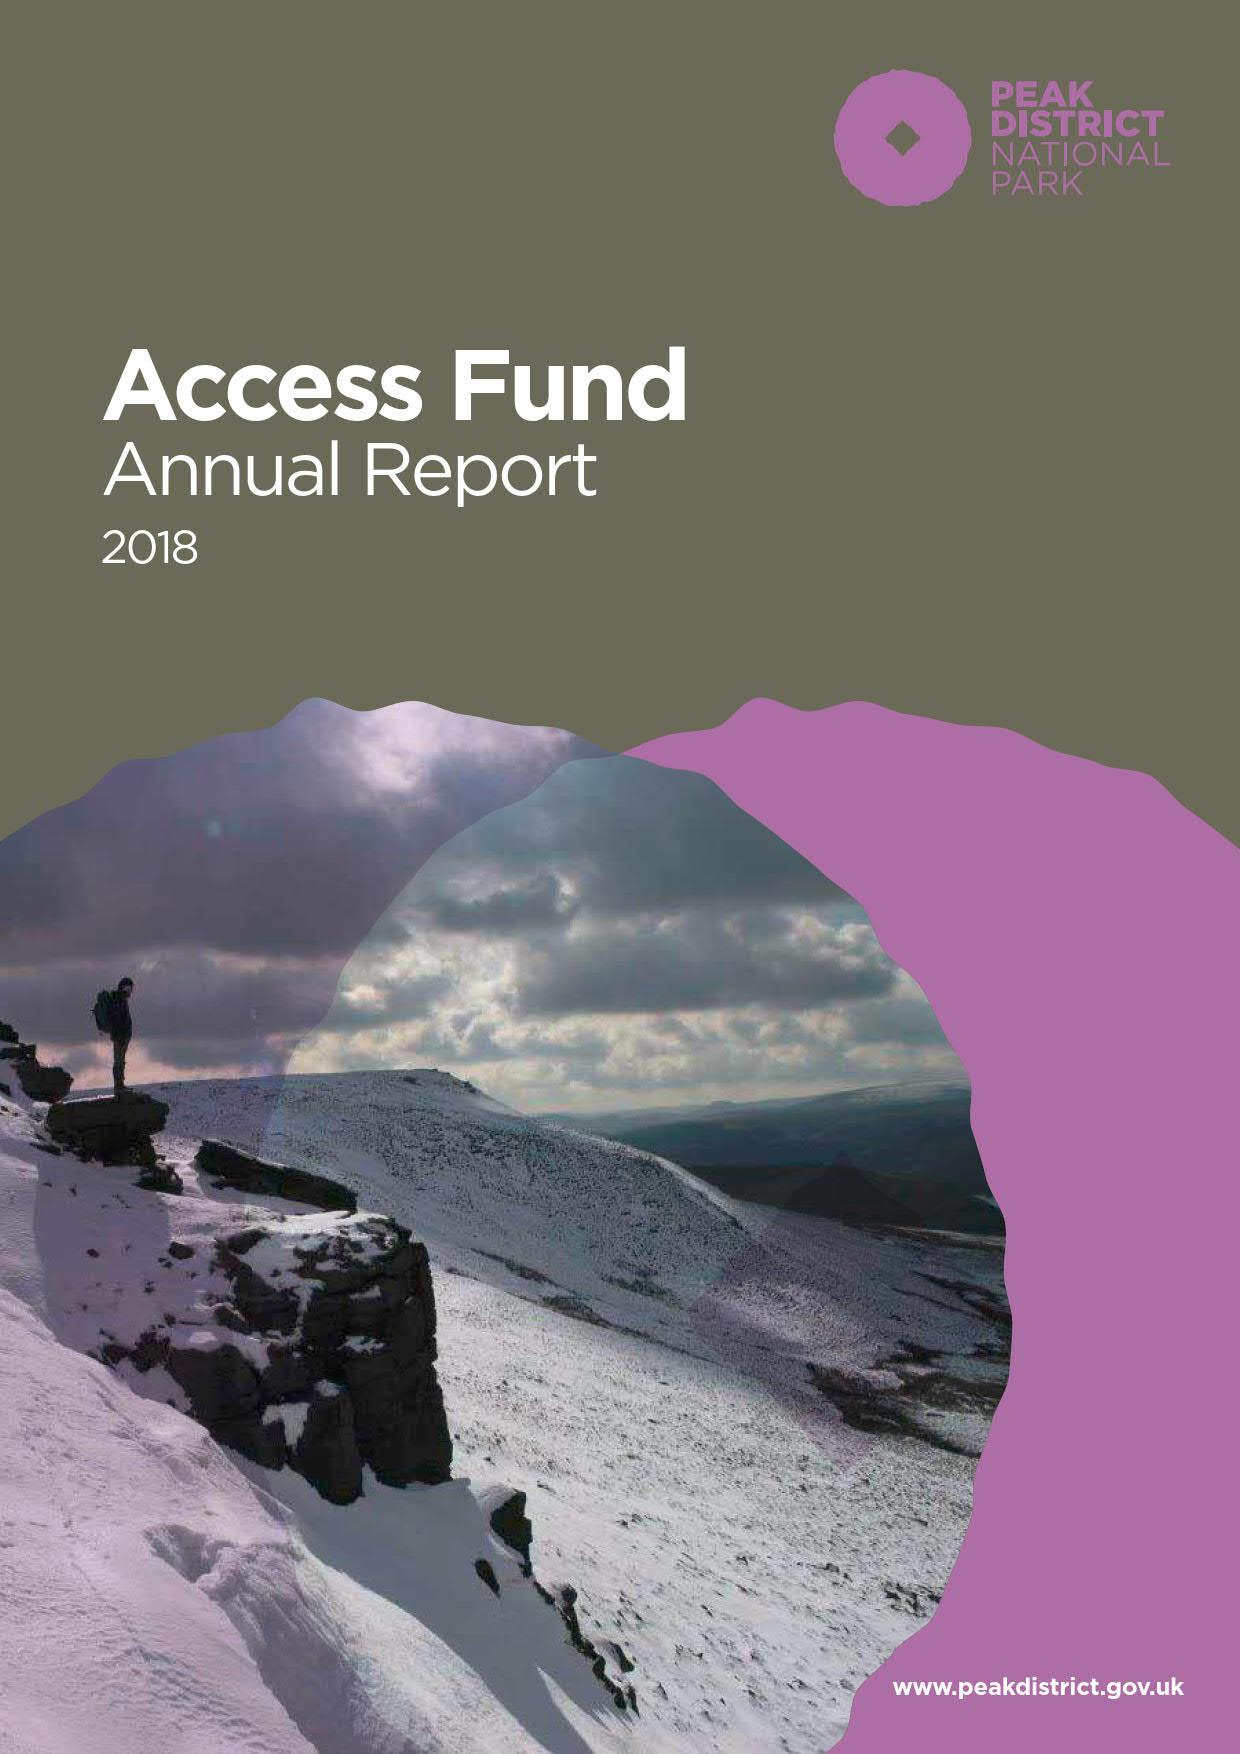 Access Fund Annual Report 2018